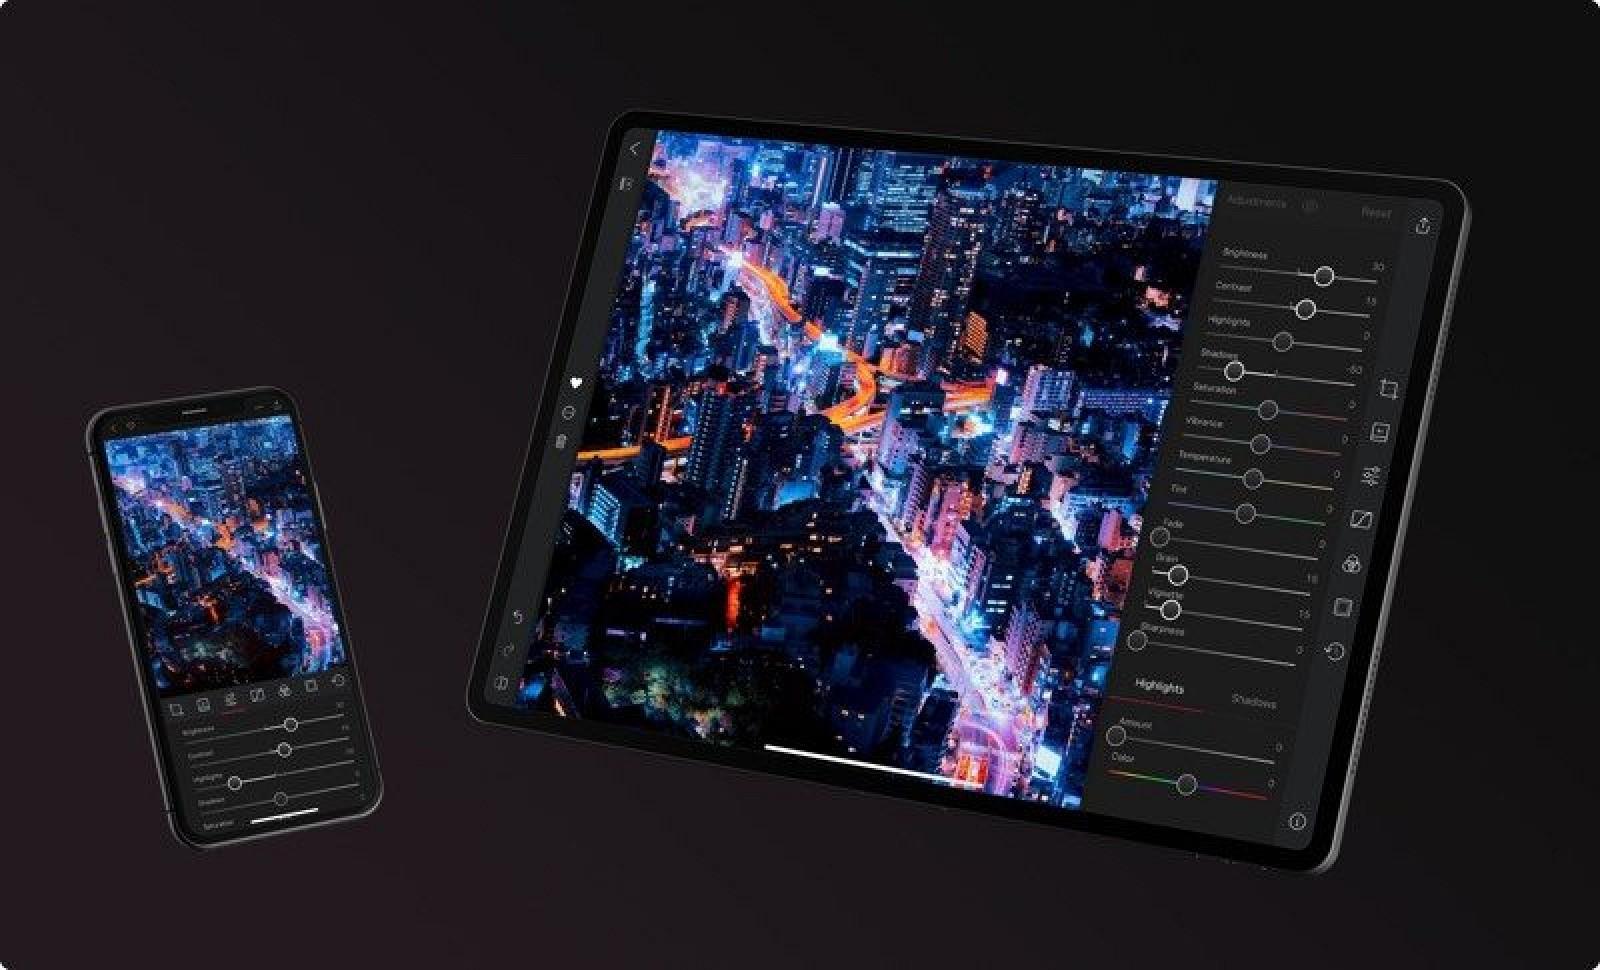 Popular Photo Editing App 'Darkroom' Expands to the iPad